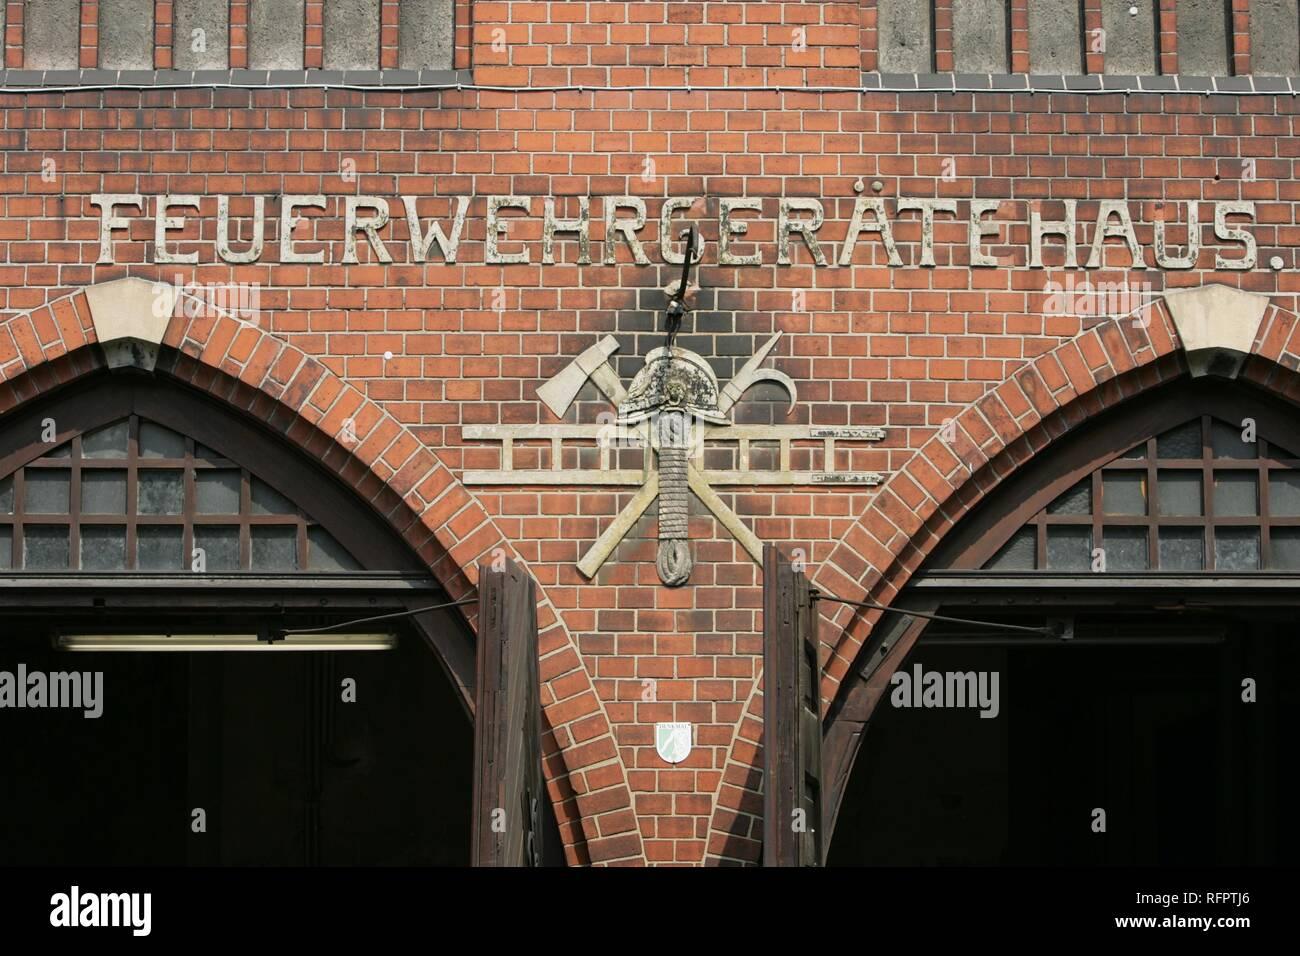 DEU, Federal Republic of Germany, Essen: Fire station of a volounteer fire brigade. Beer mugs. - Stock Image